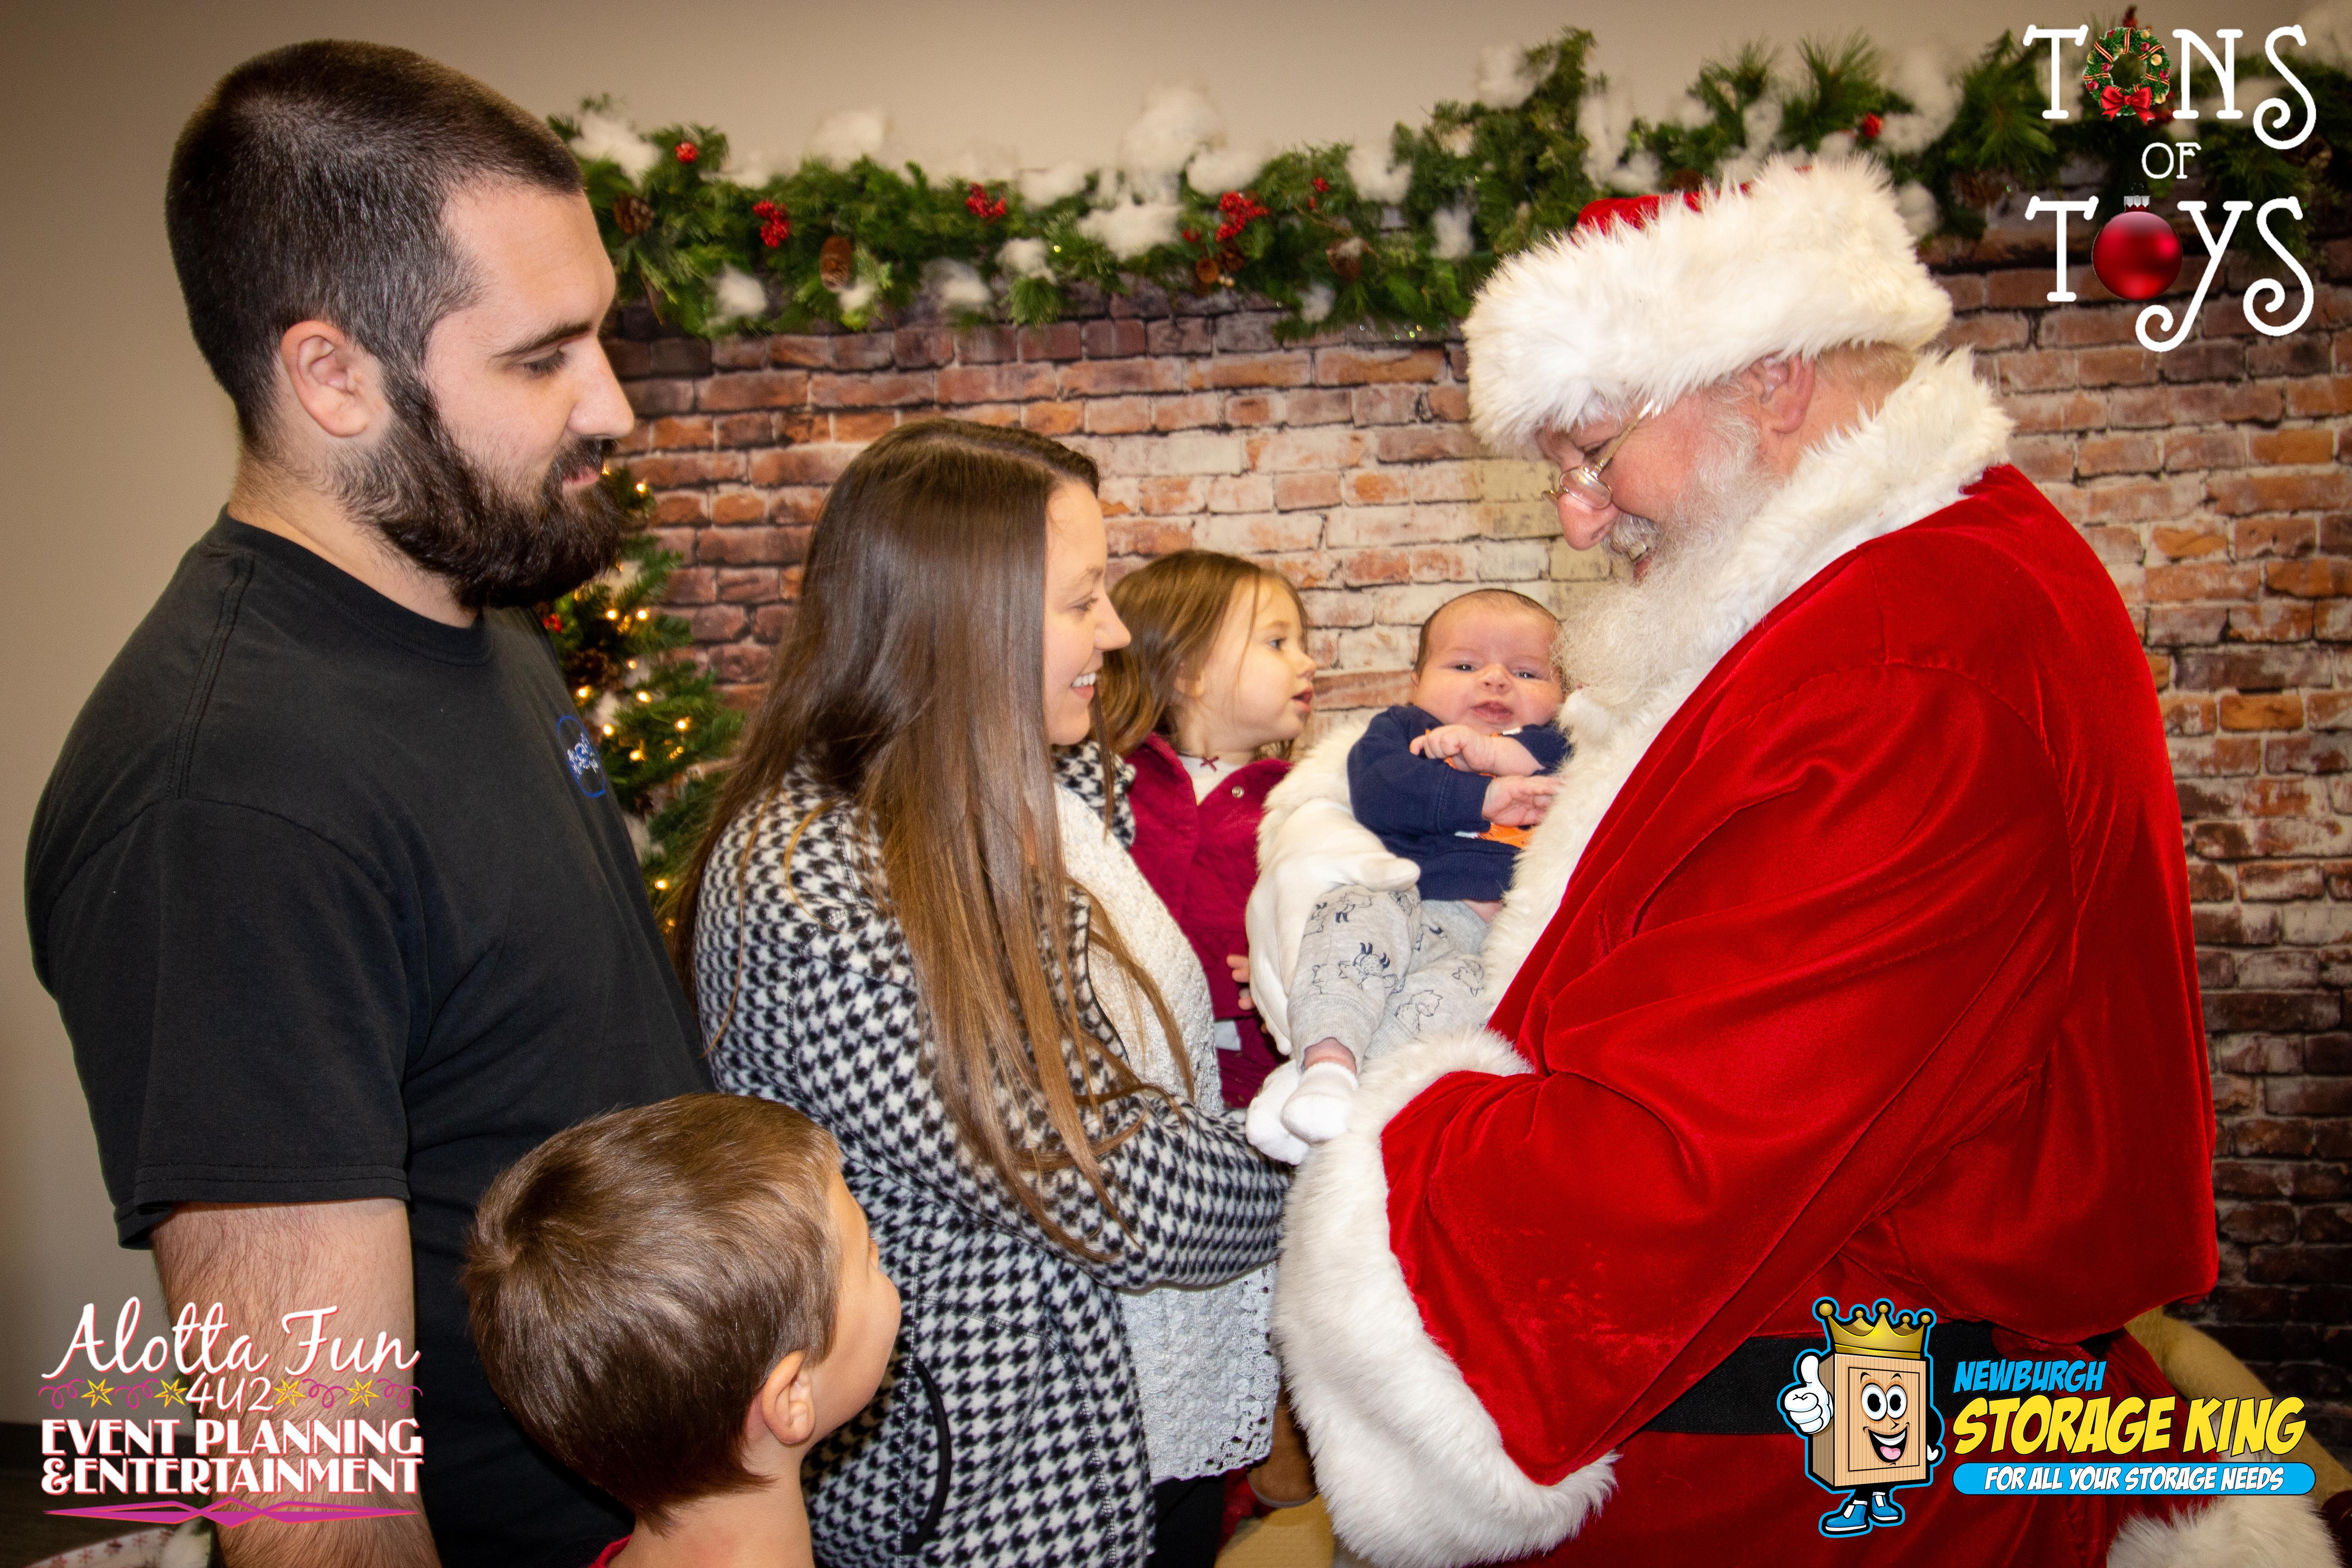 family gathered around santa holding baby